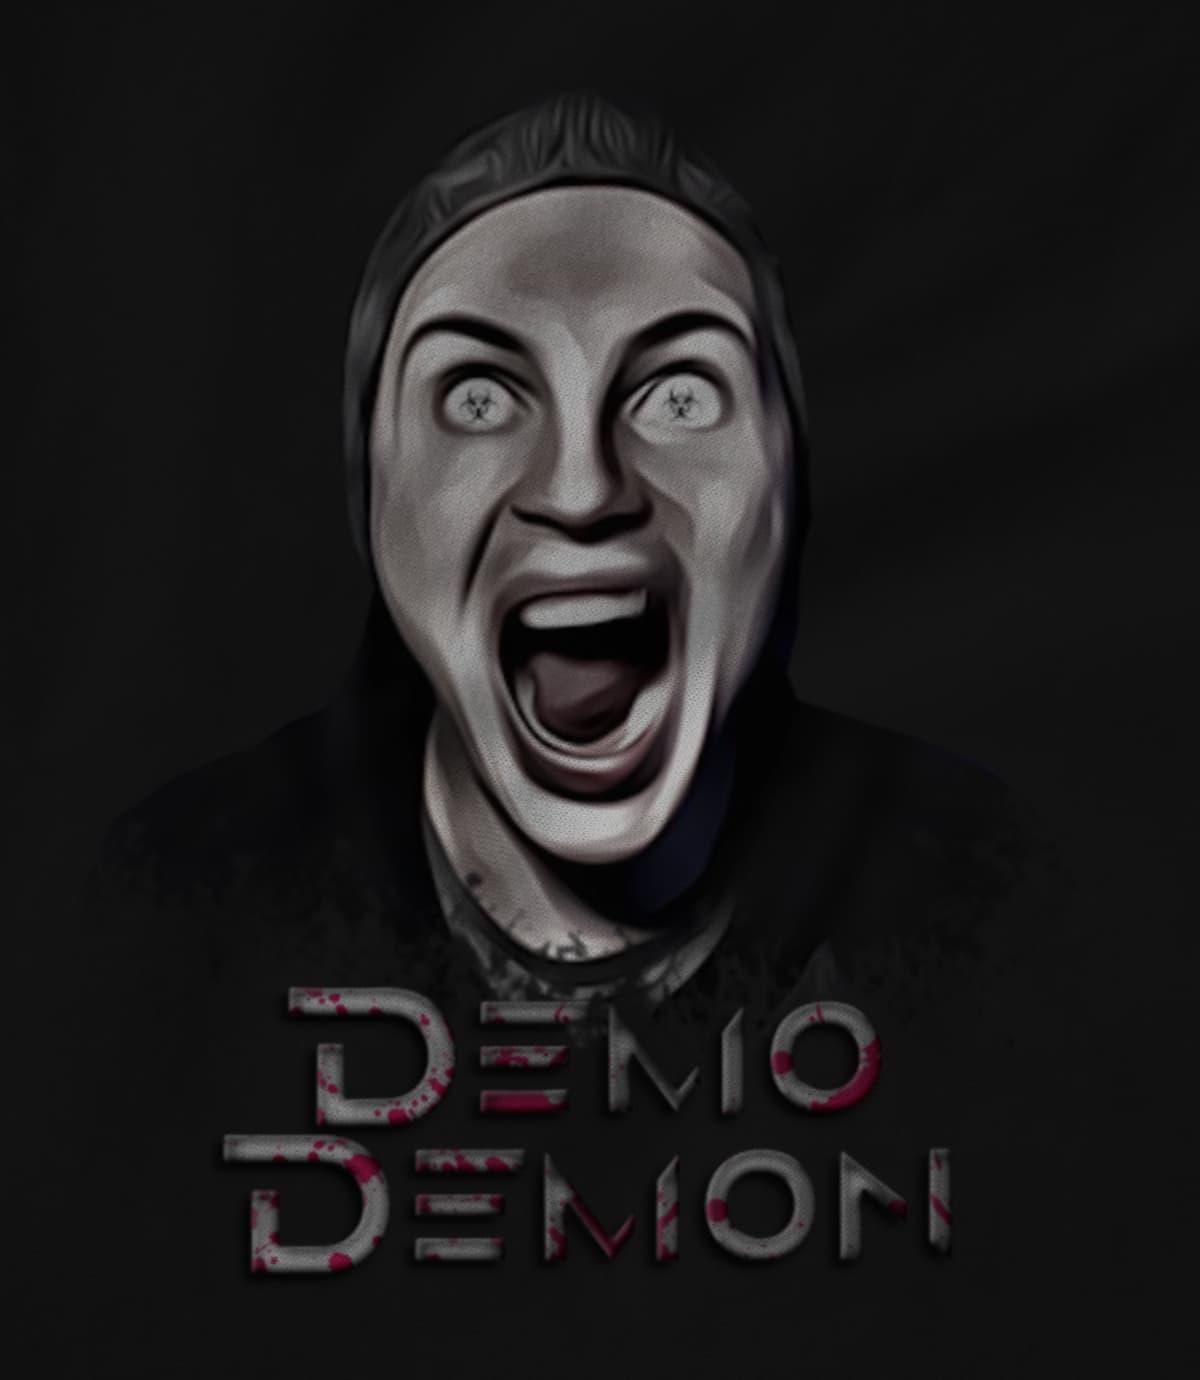 Demo demon quarintine 1595878788